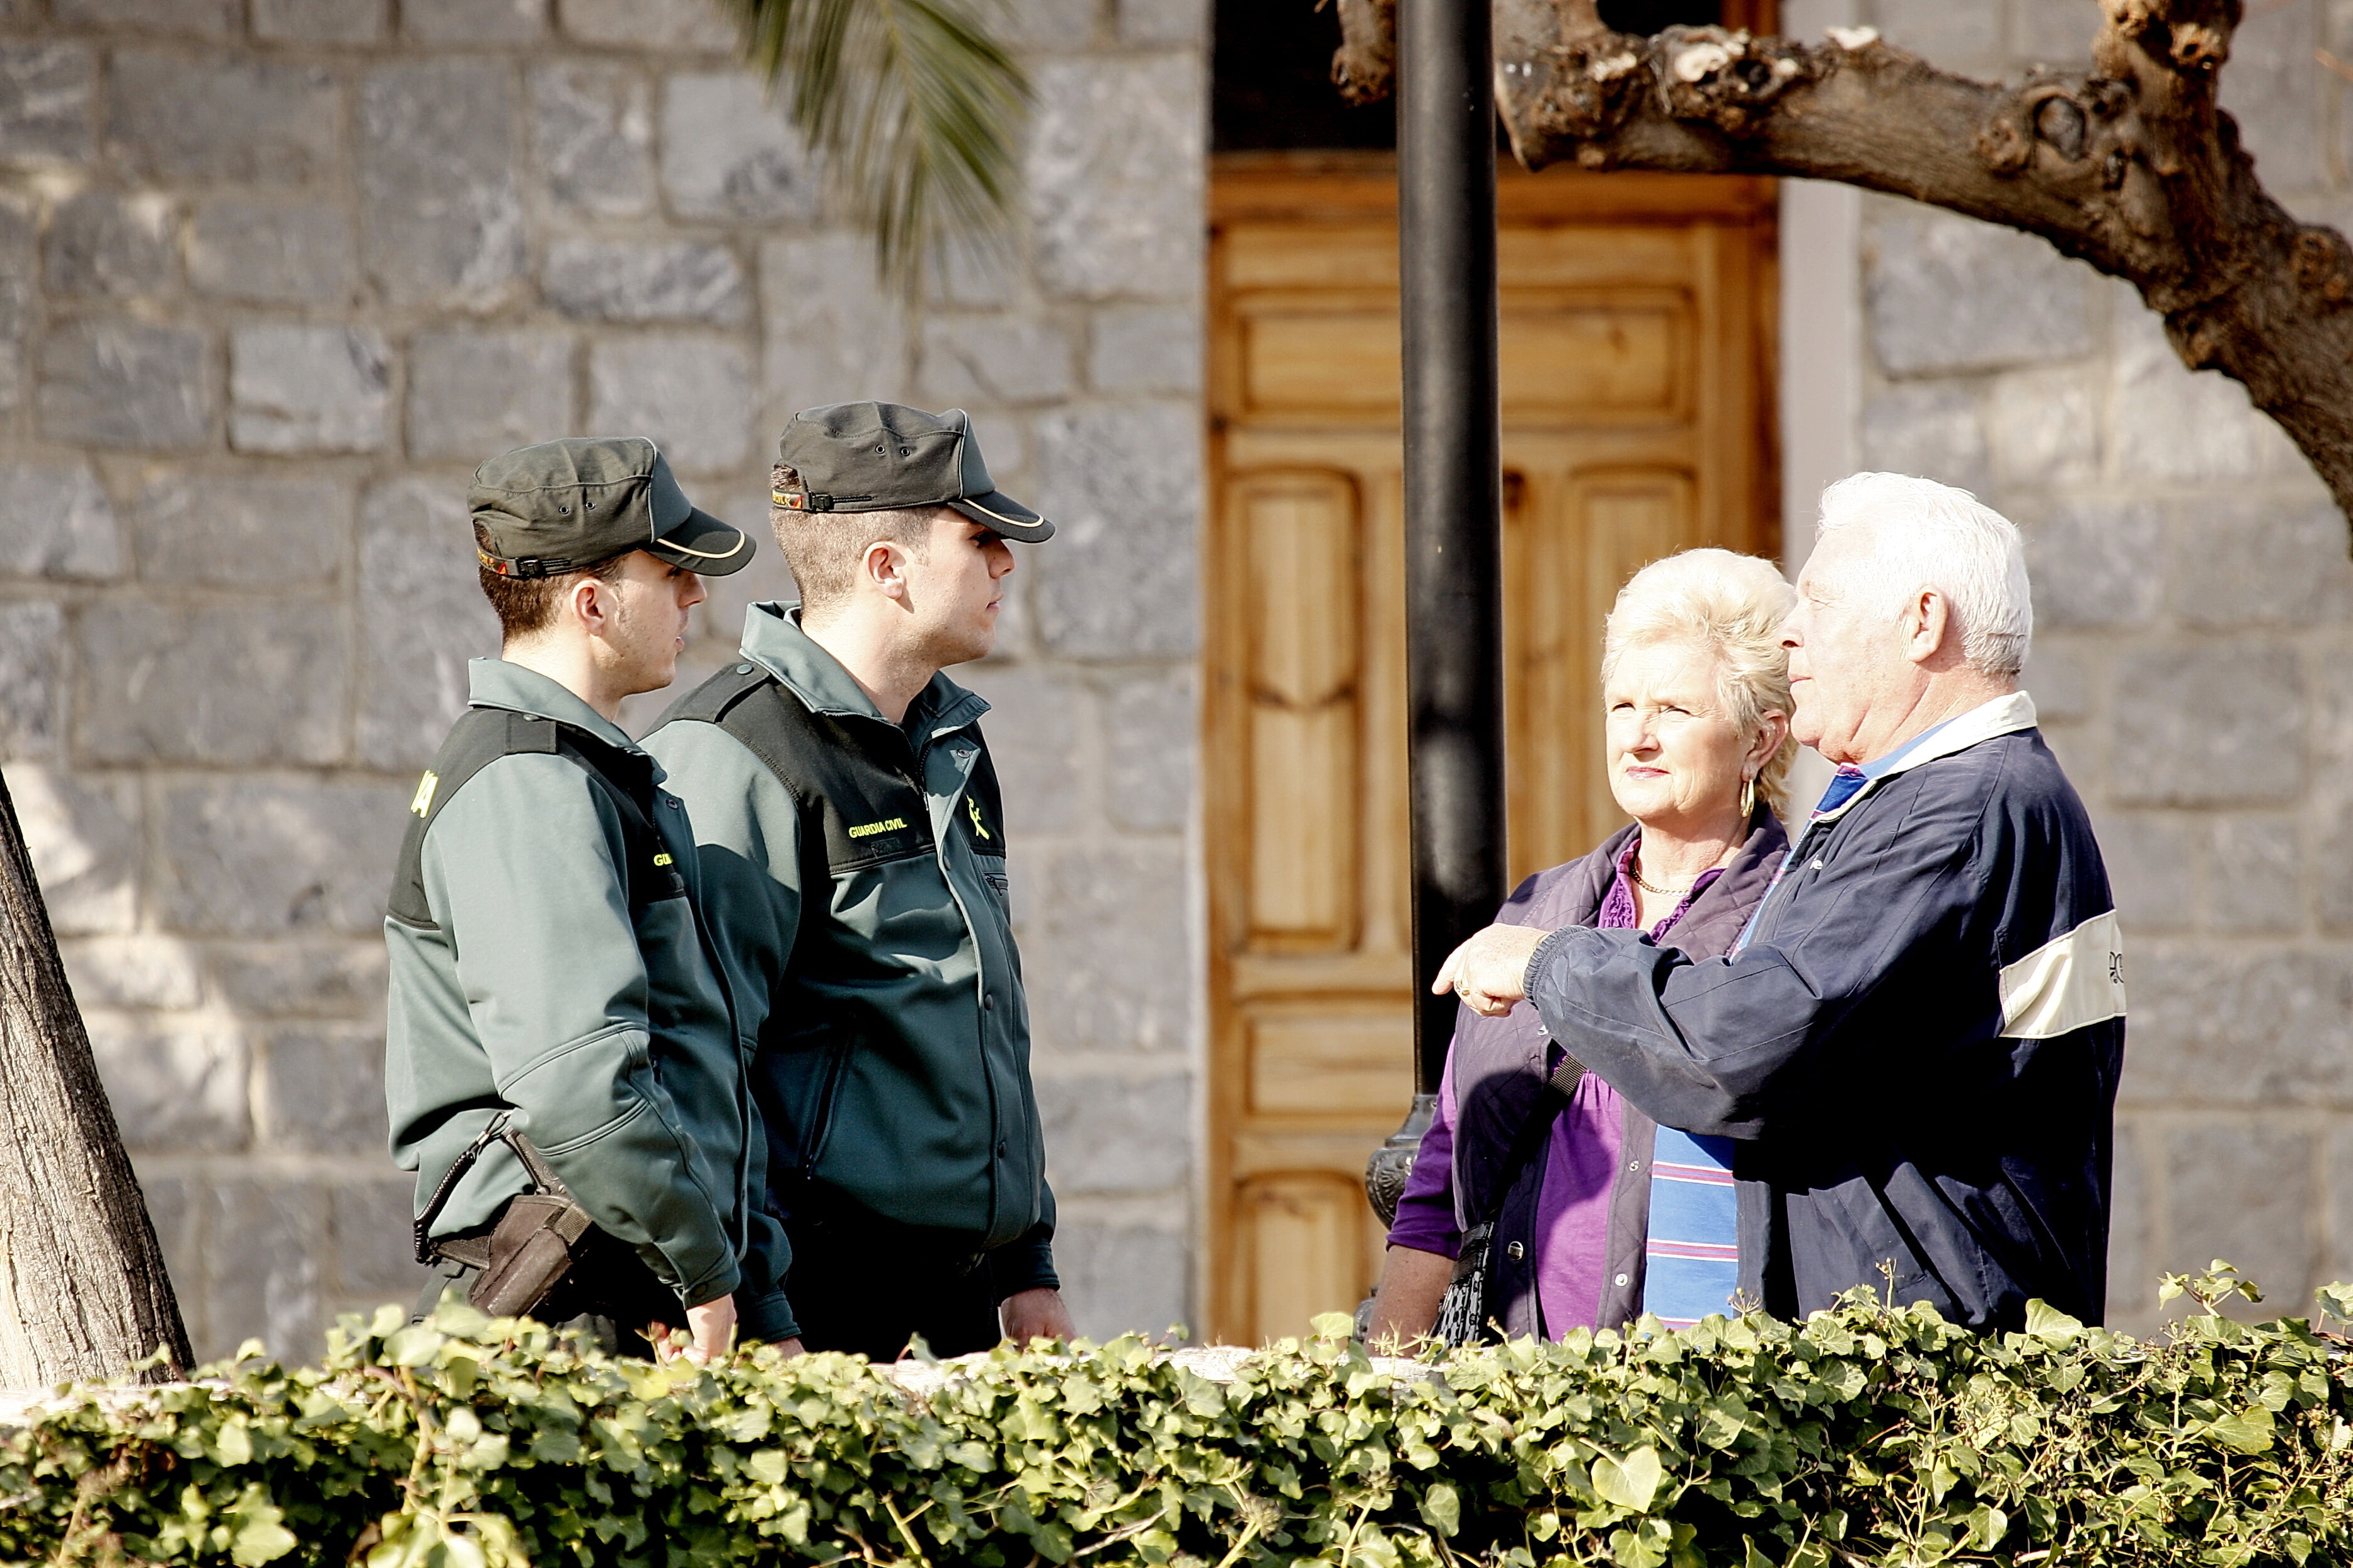 La Guàrdia Civil atén uns ciutadans